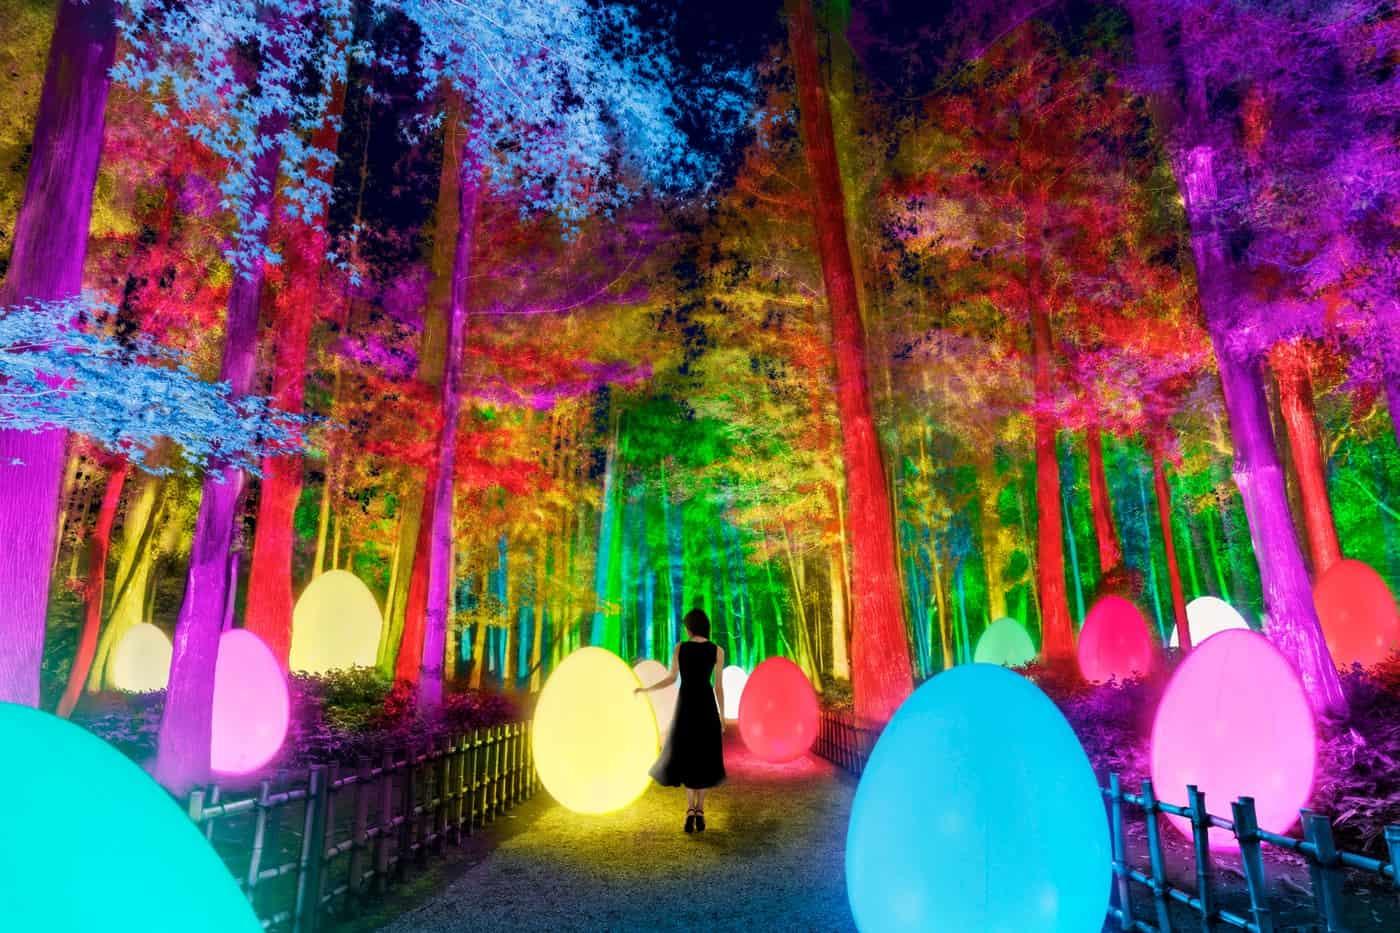 teamLab: Digitized Kairakuen Garden